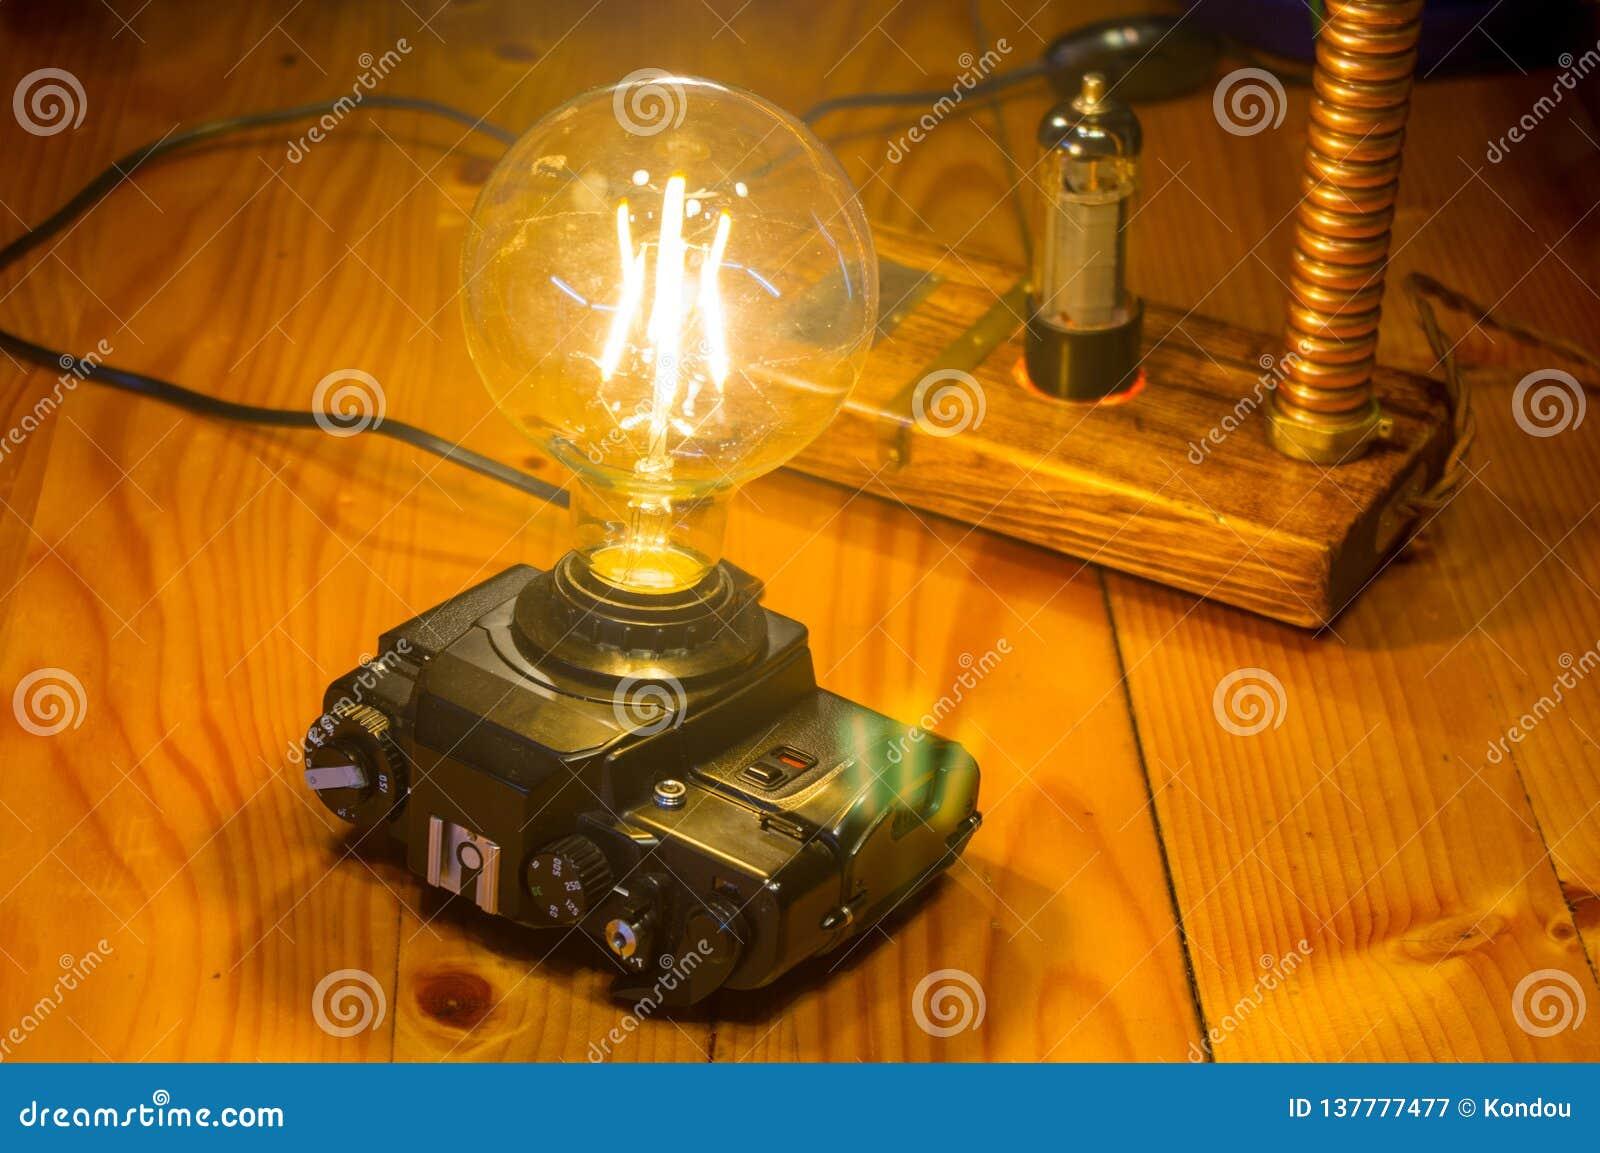 Retro Lampen Led : Light fixture handmade in vintage style led lamp stock image